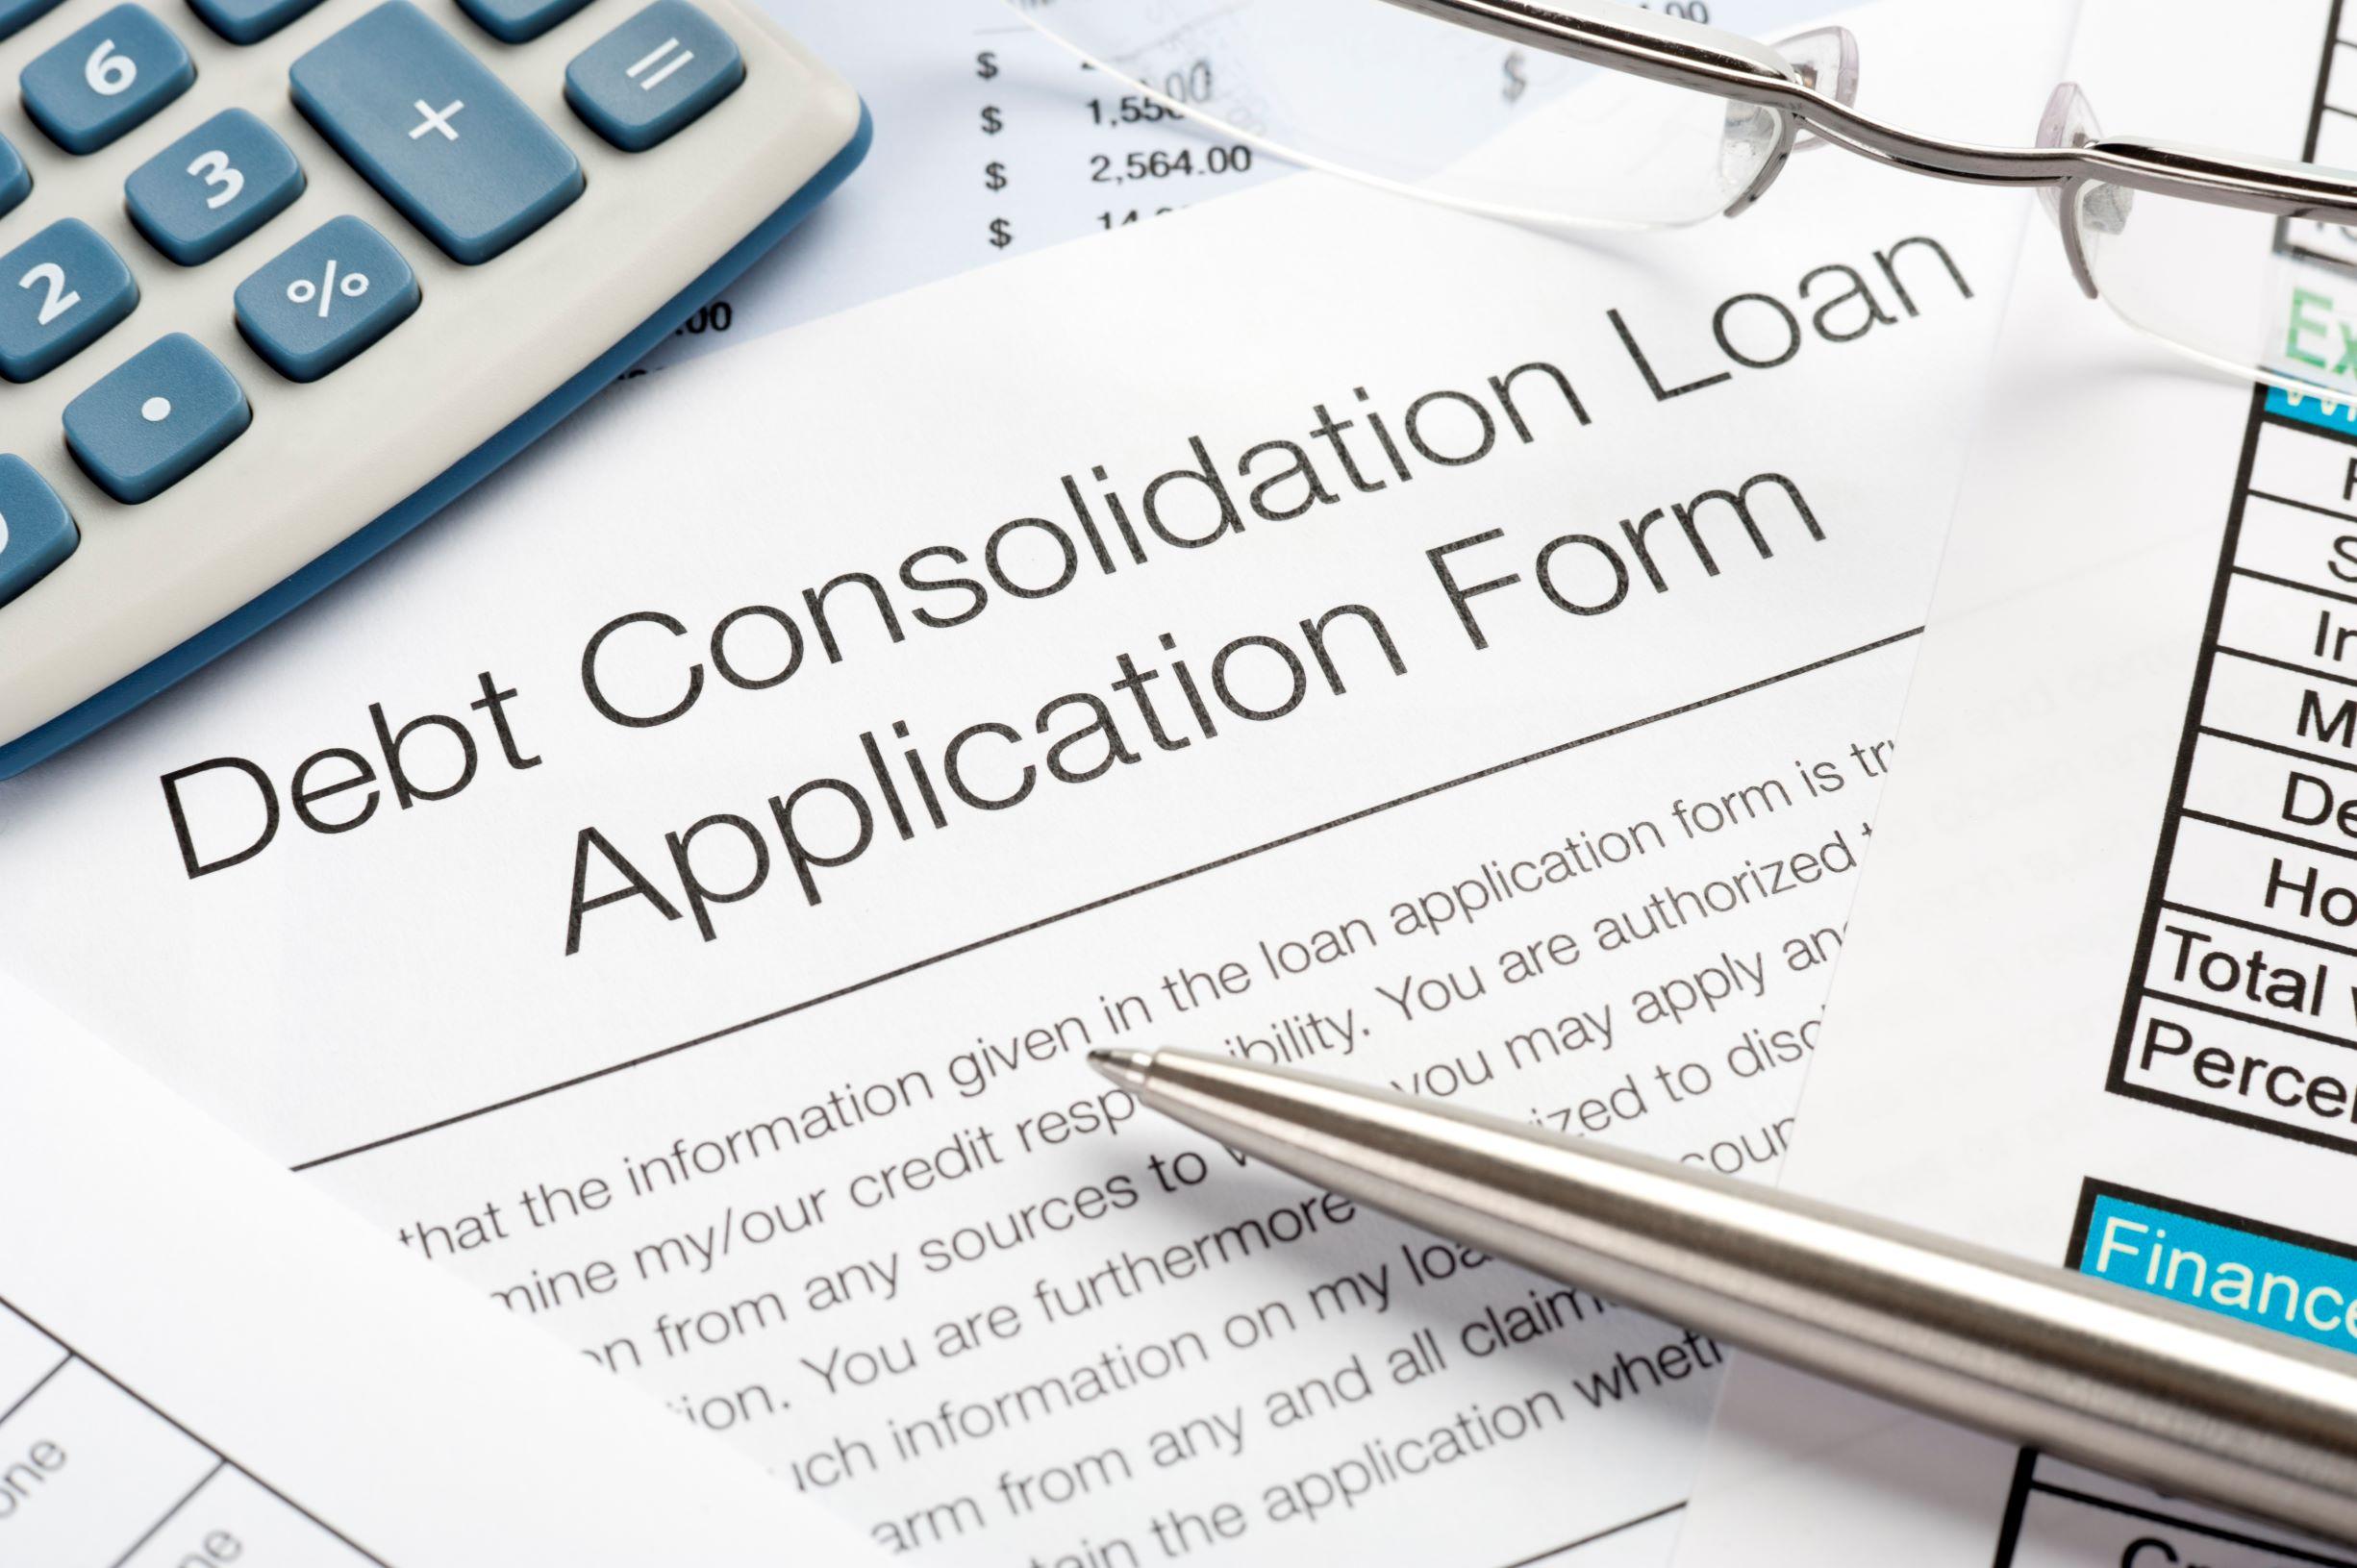 Debt Consolidation Application Form